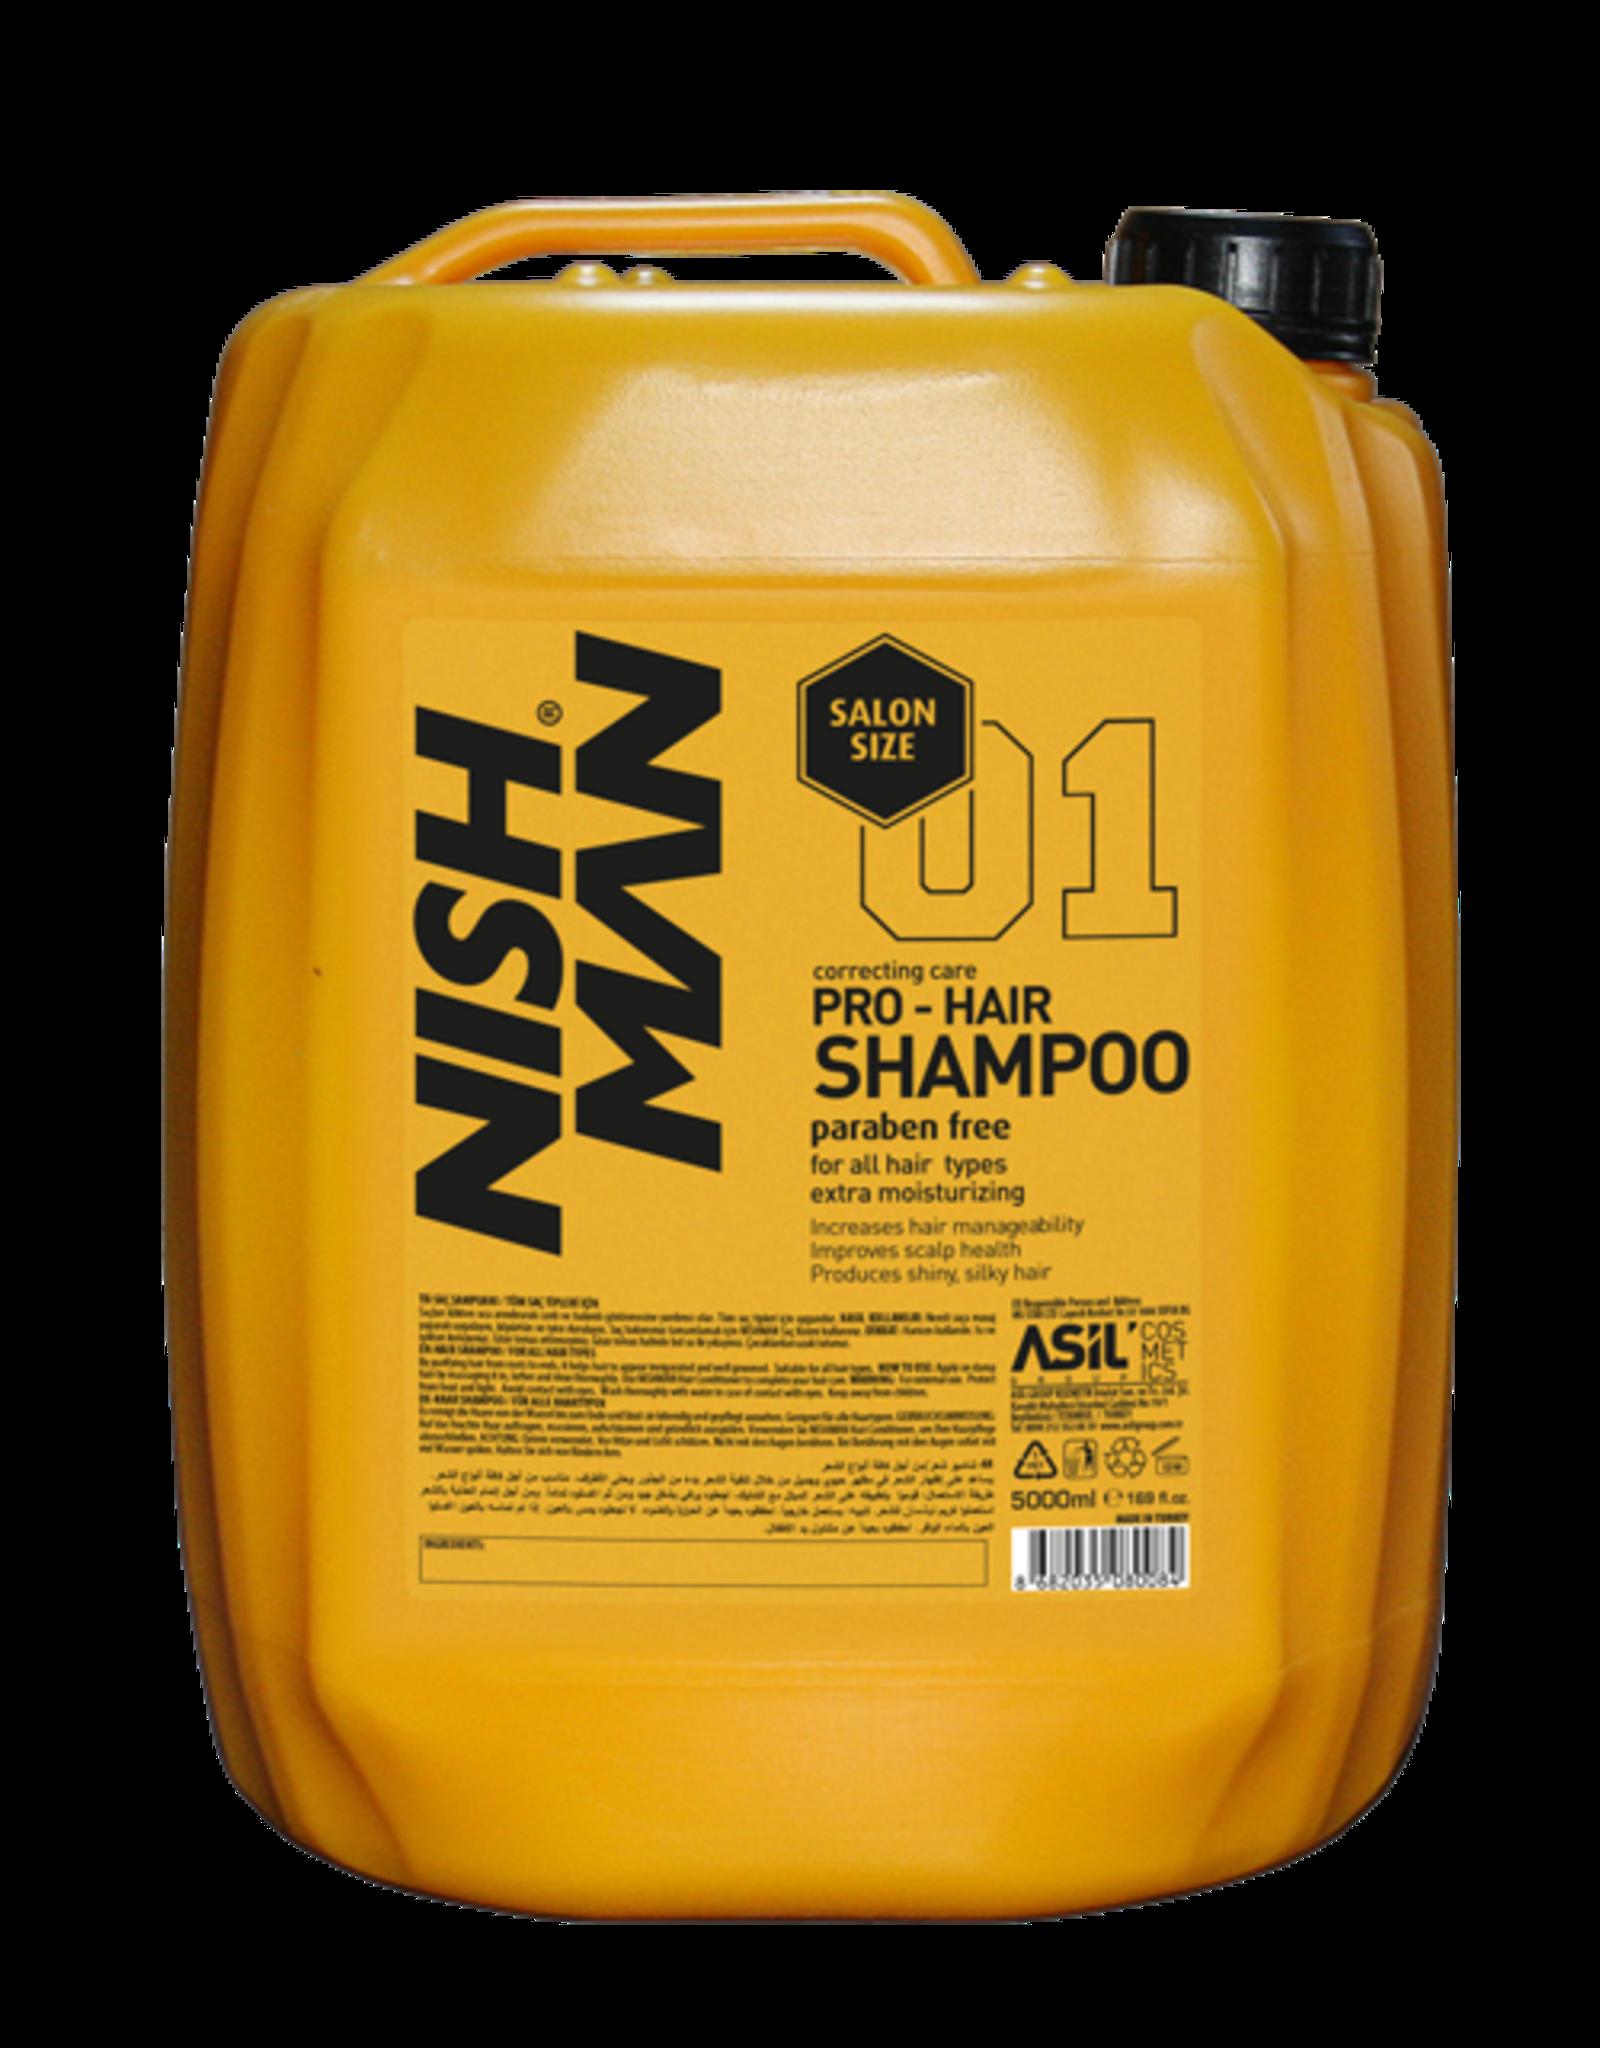 Salon Shampoo 5 Liter